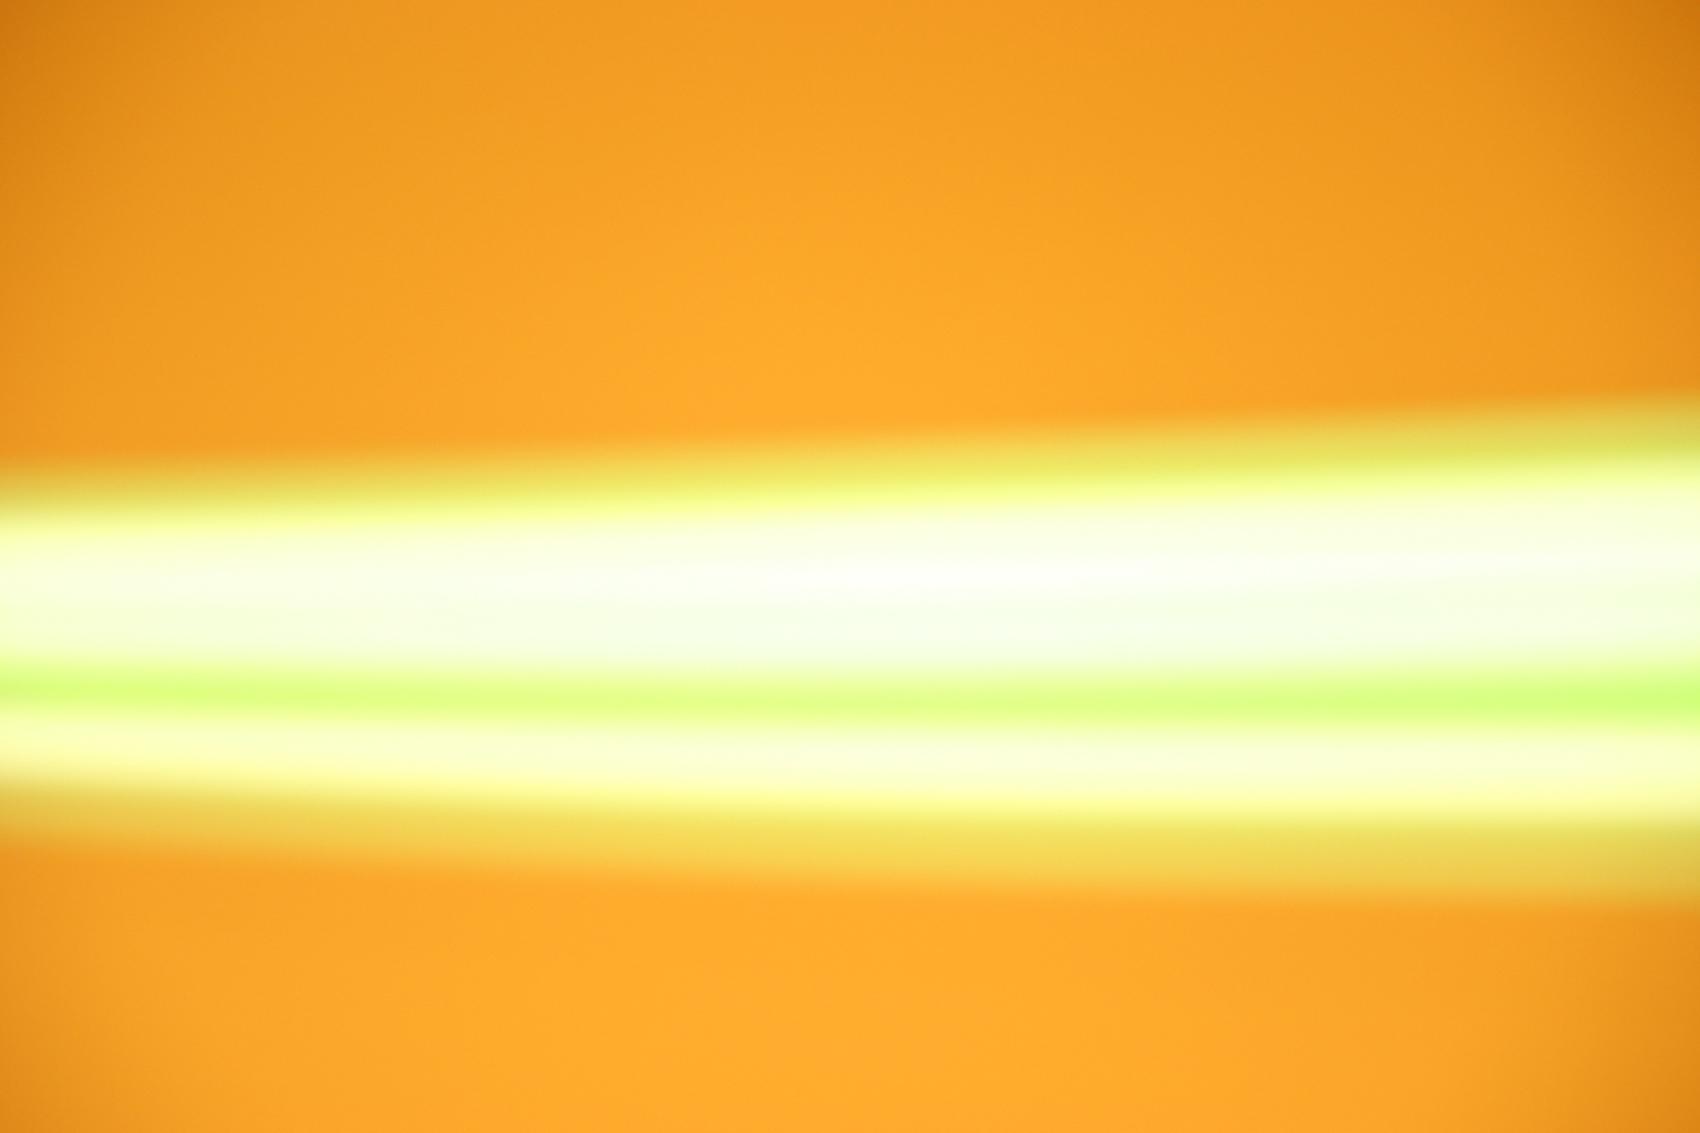 Orange light effect, Effect, Light, Orange, Texture, HQ Photo